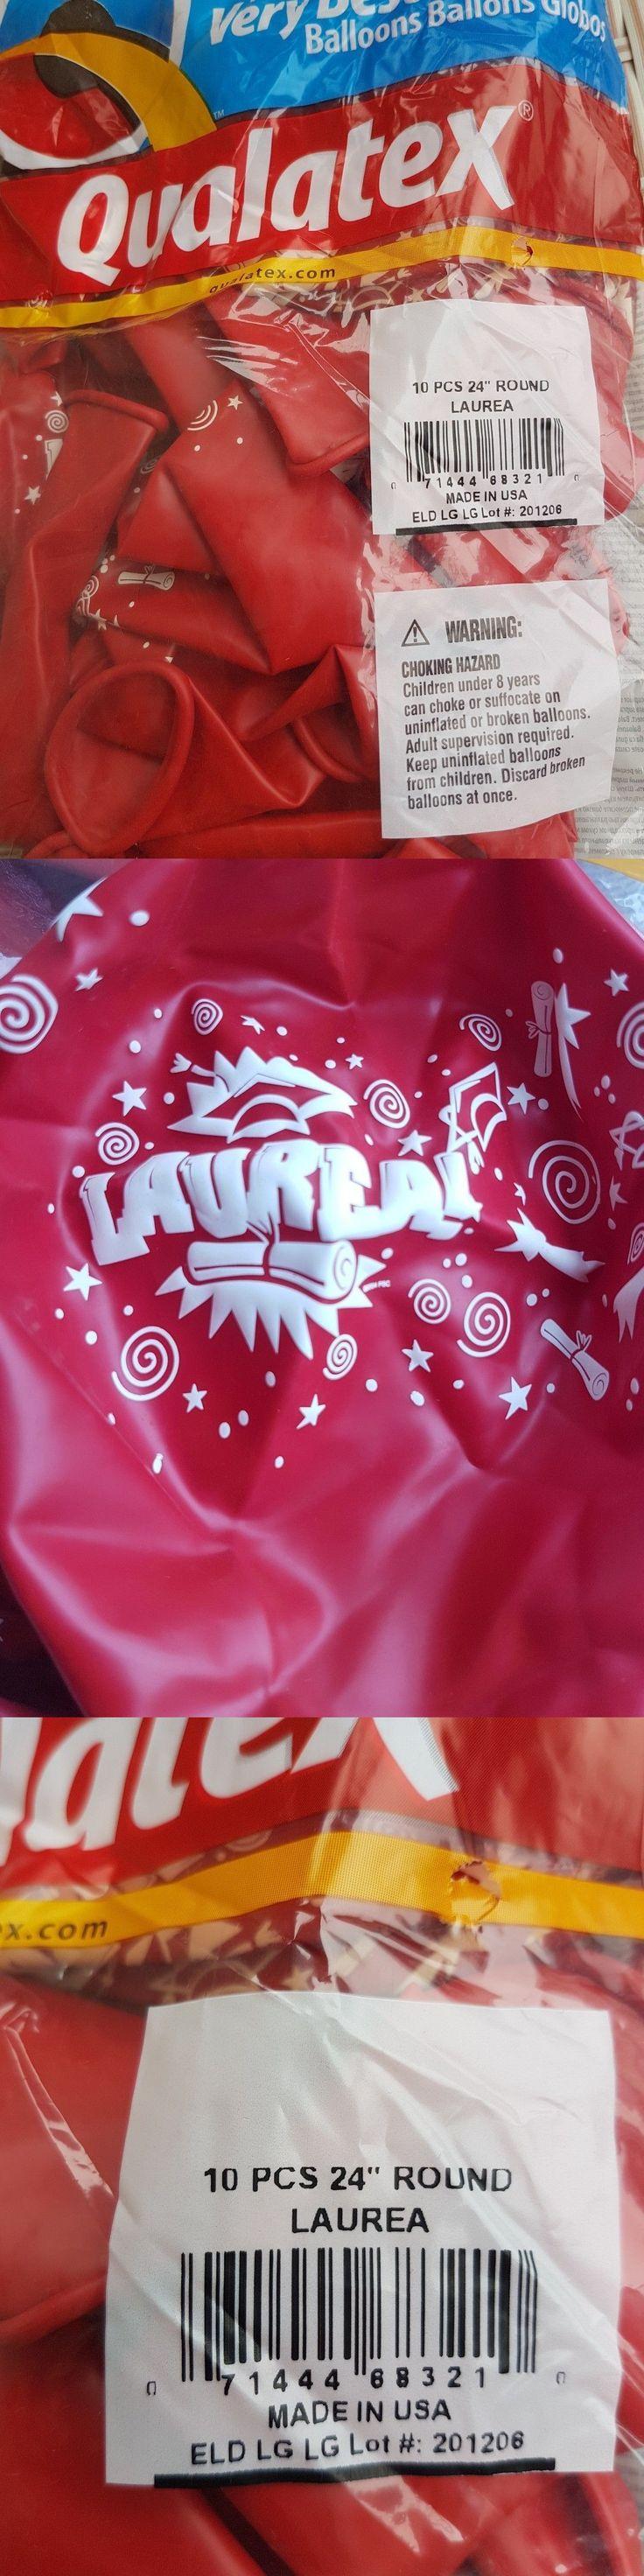 Balloons 26384: 50 Laurea Graduation Red 24 Balloon. Qualatex Helium Looner Riesenballon #12 -> BUY IT NOW ONLY: $49.99 on eBay!